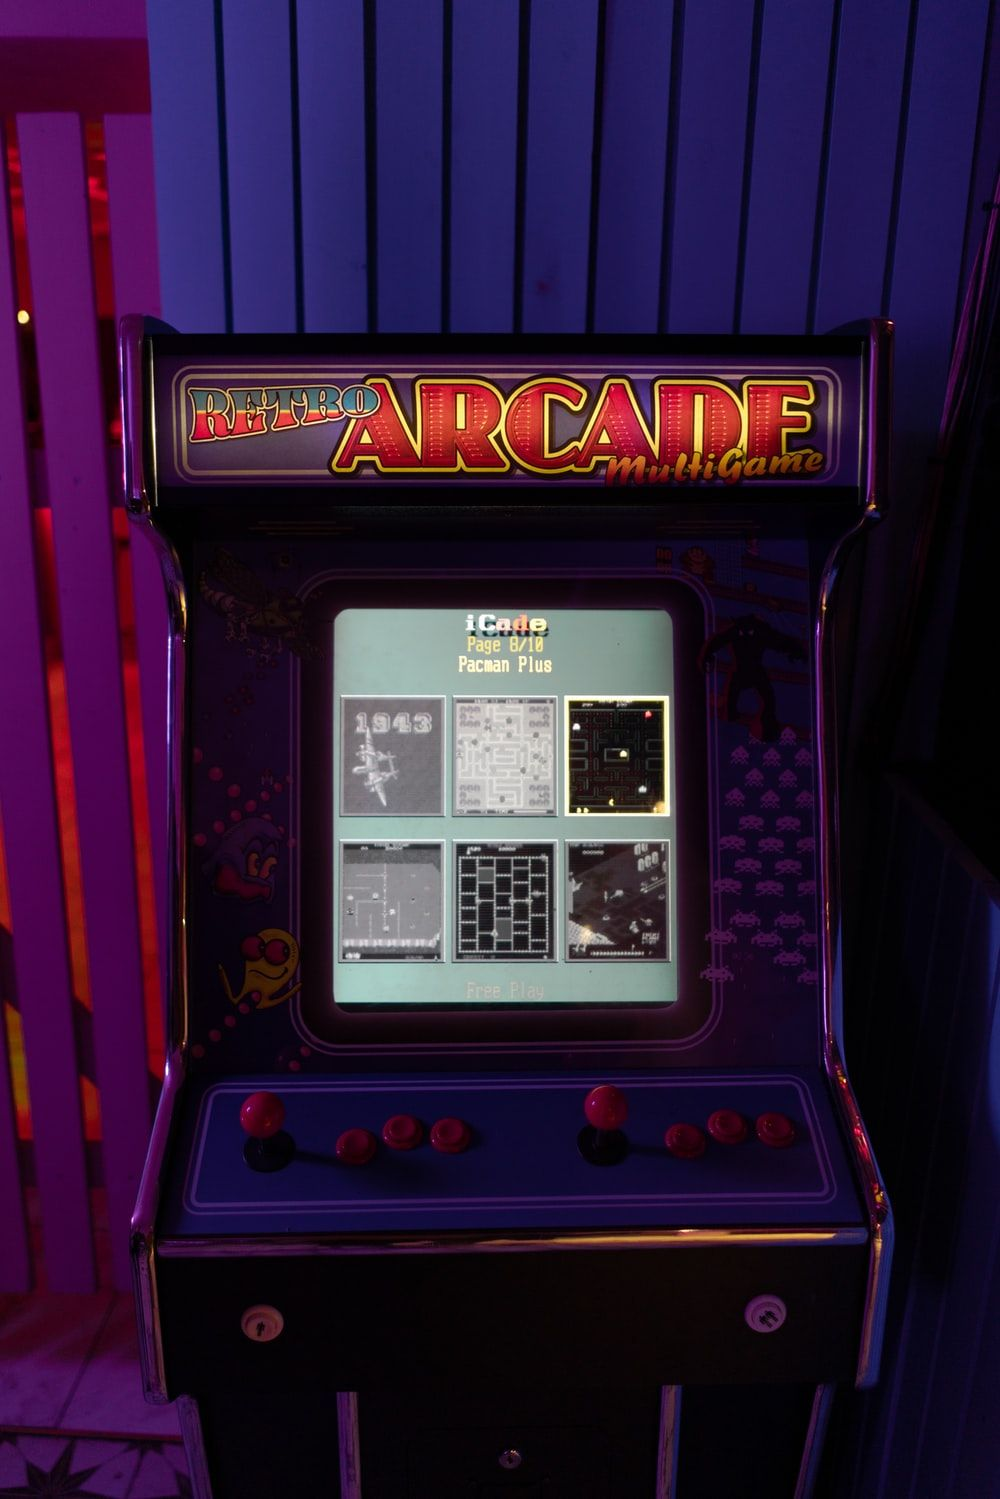 Vintage Arcade Game Wallpapers On Wallpaperdog